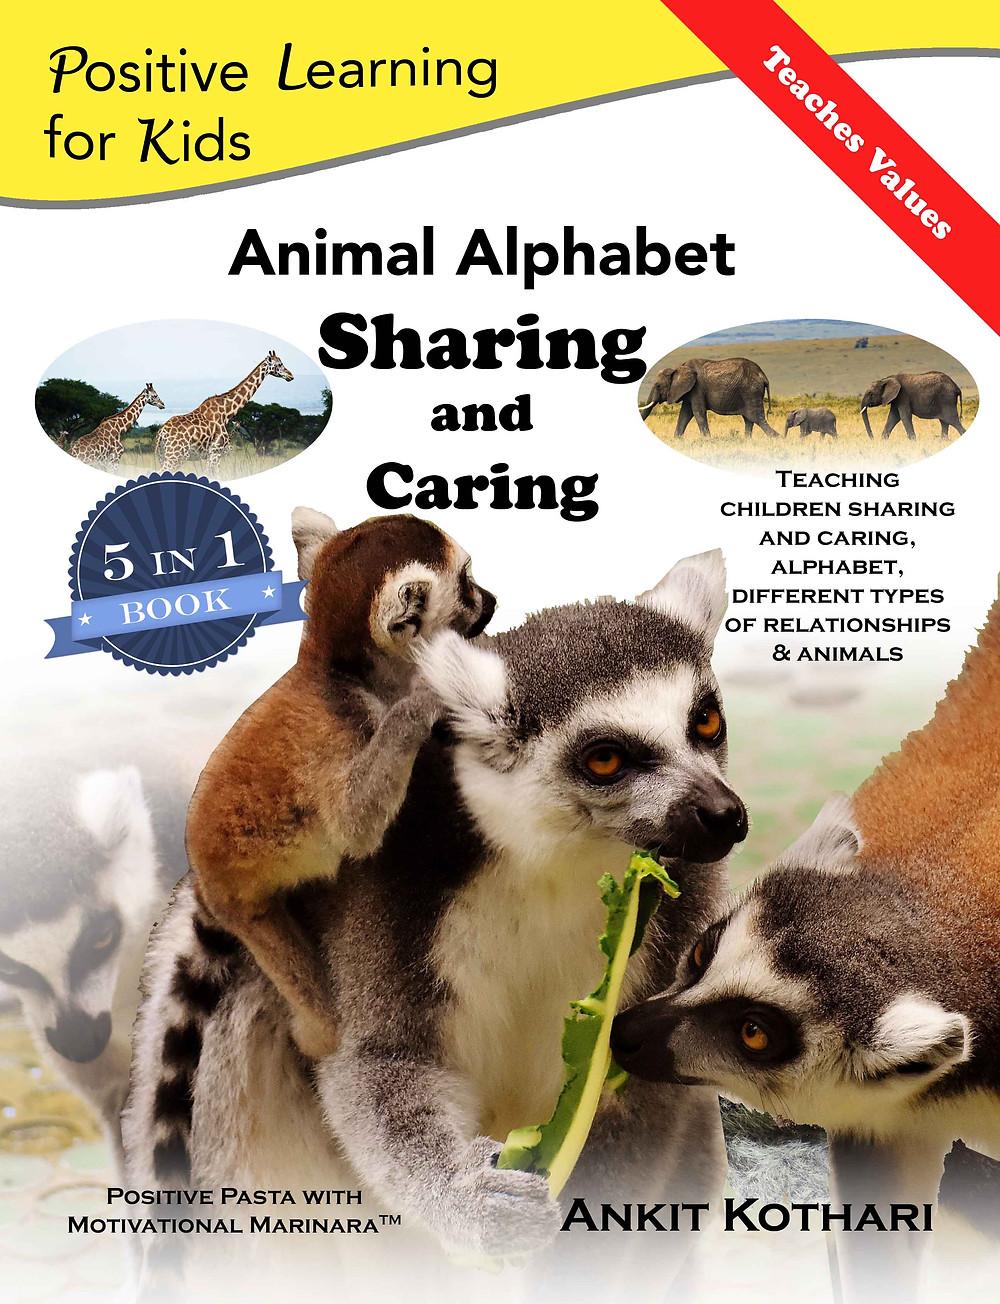 Animal Alphabet Sharing and Caring